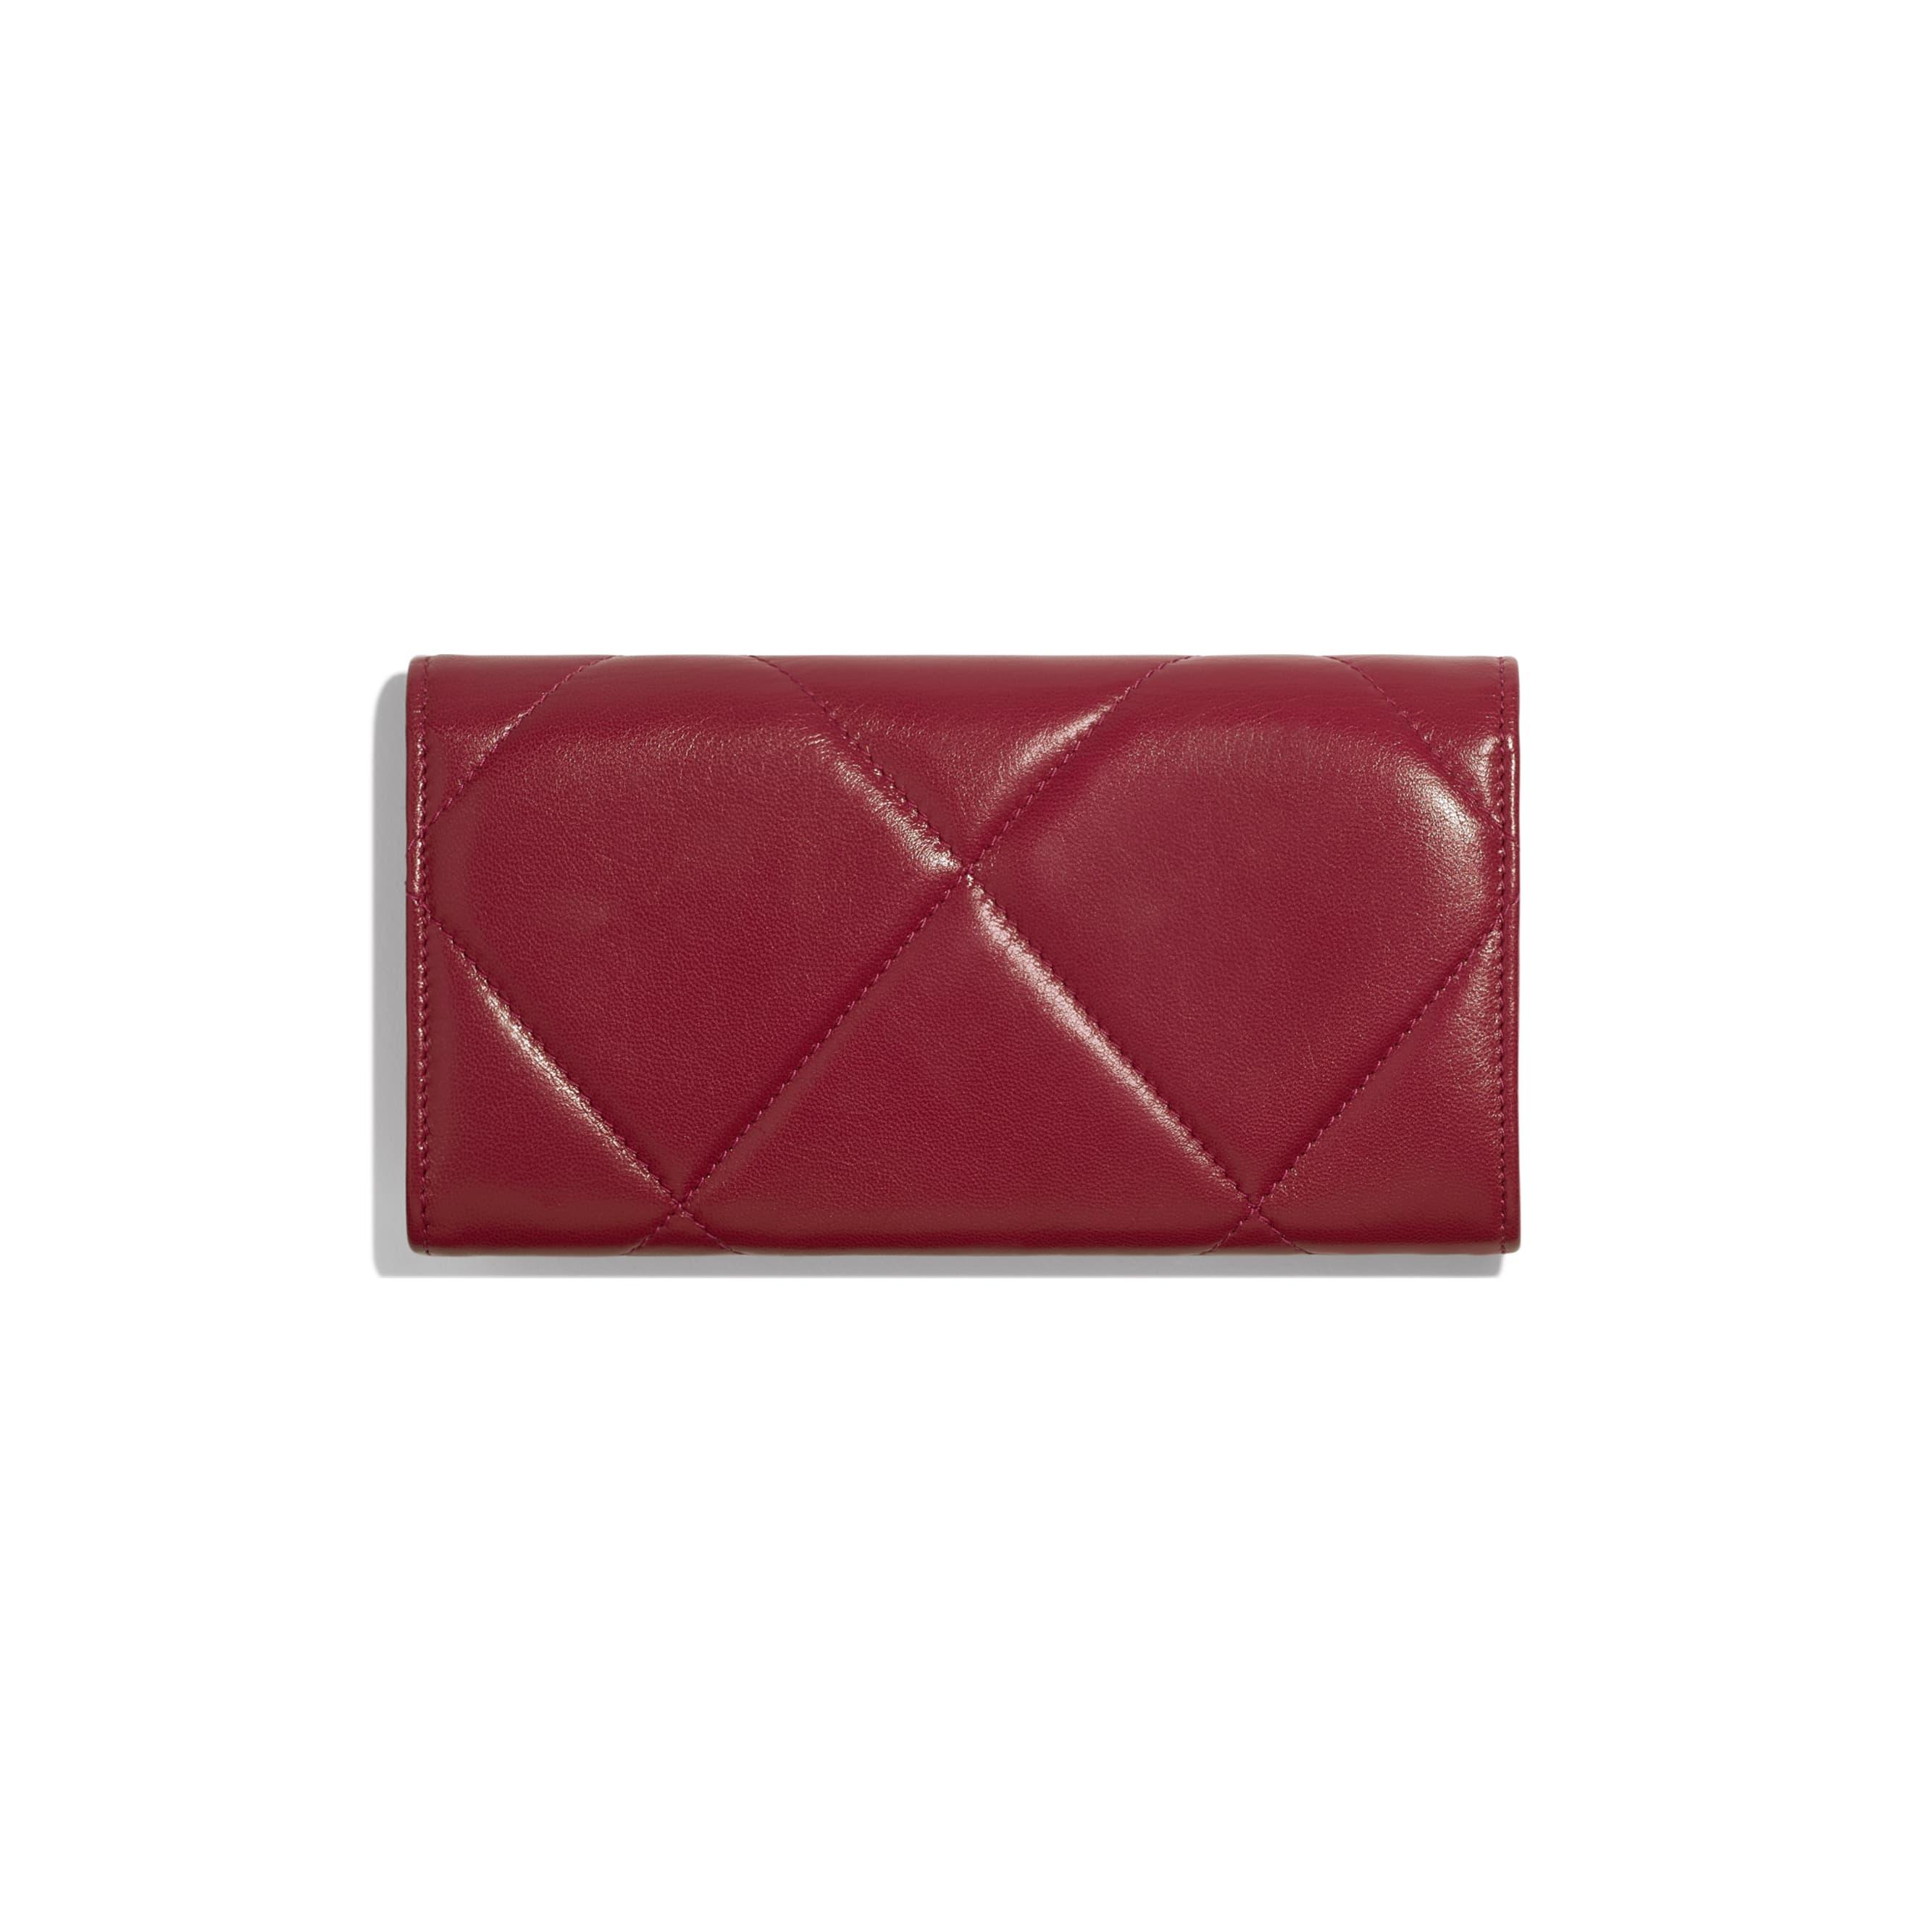 CHANEL 19 Long Flap Wallet - Dark Pink - Goatskin, Gold-Tone, Silver-Tone & Ruthenium-Finish Metal - Alternative view - see standard sized version